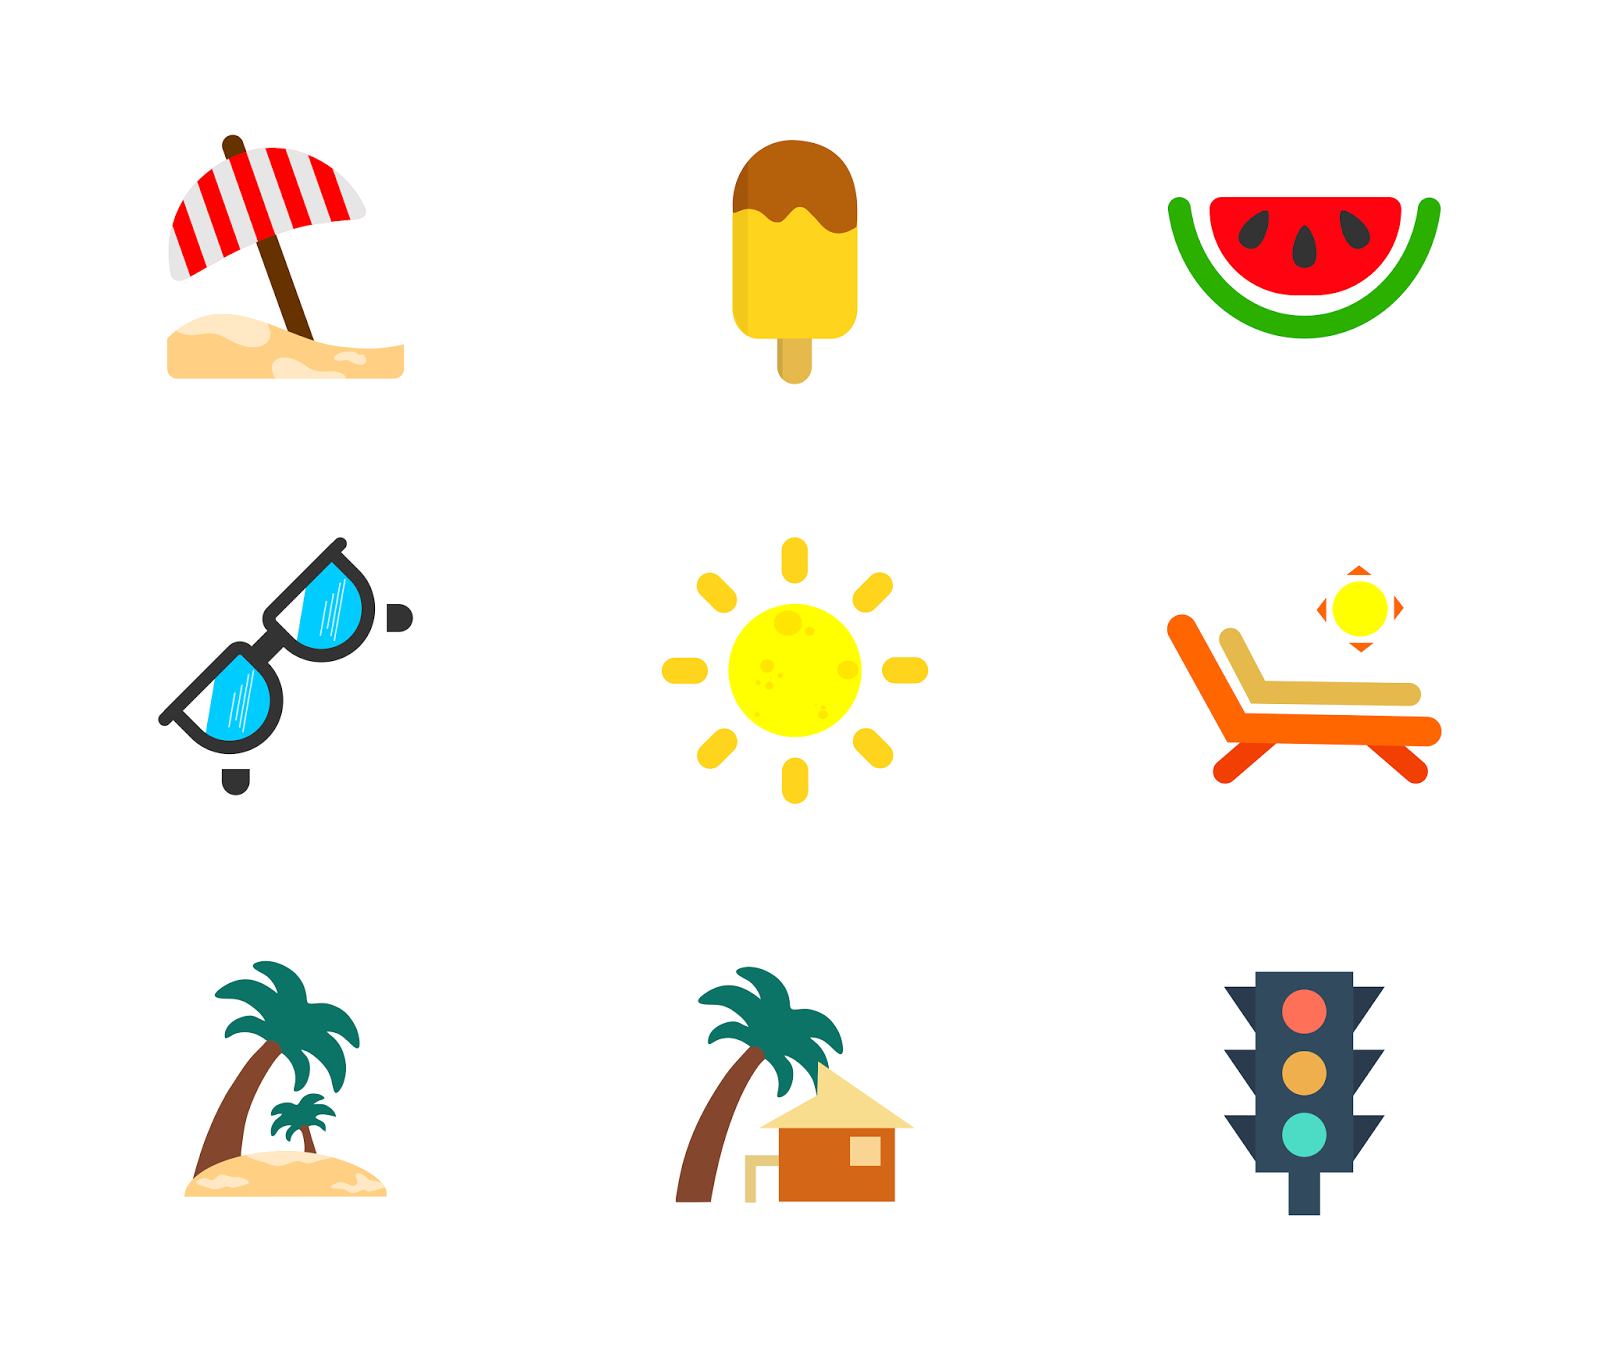 creative design idea 9 awesome app icons for inspiration free cdr rh pinterest com